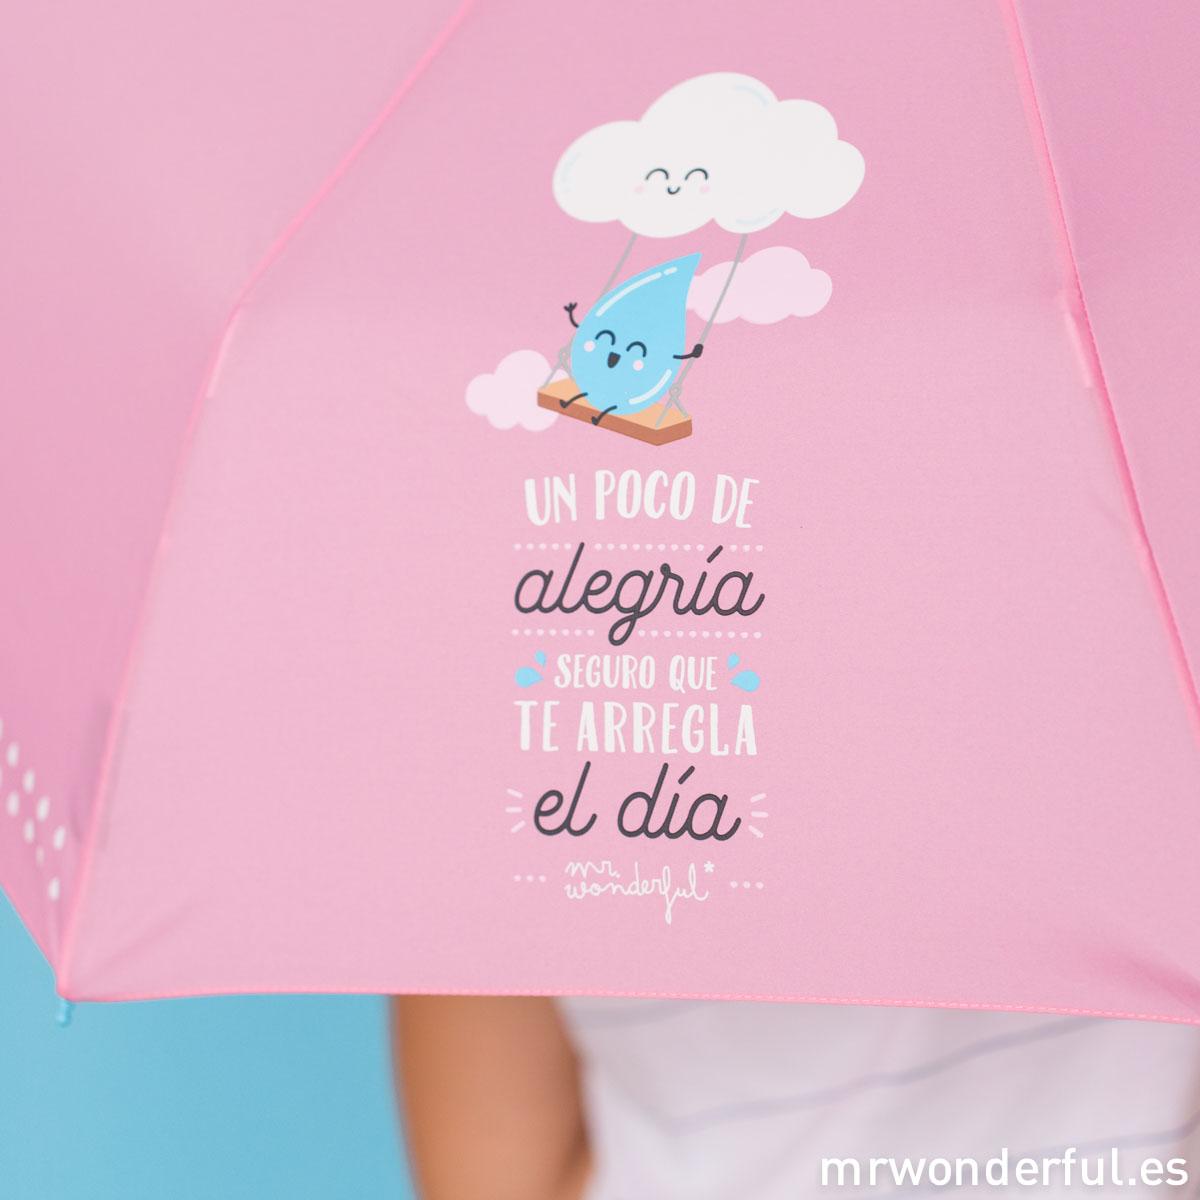 mrwonderful_8435460706865_paraguas_un-poco-de-alegria-seguro-que-te-arregla-el-dia-ES-6